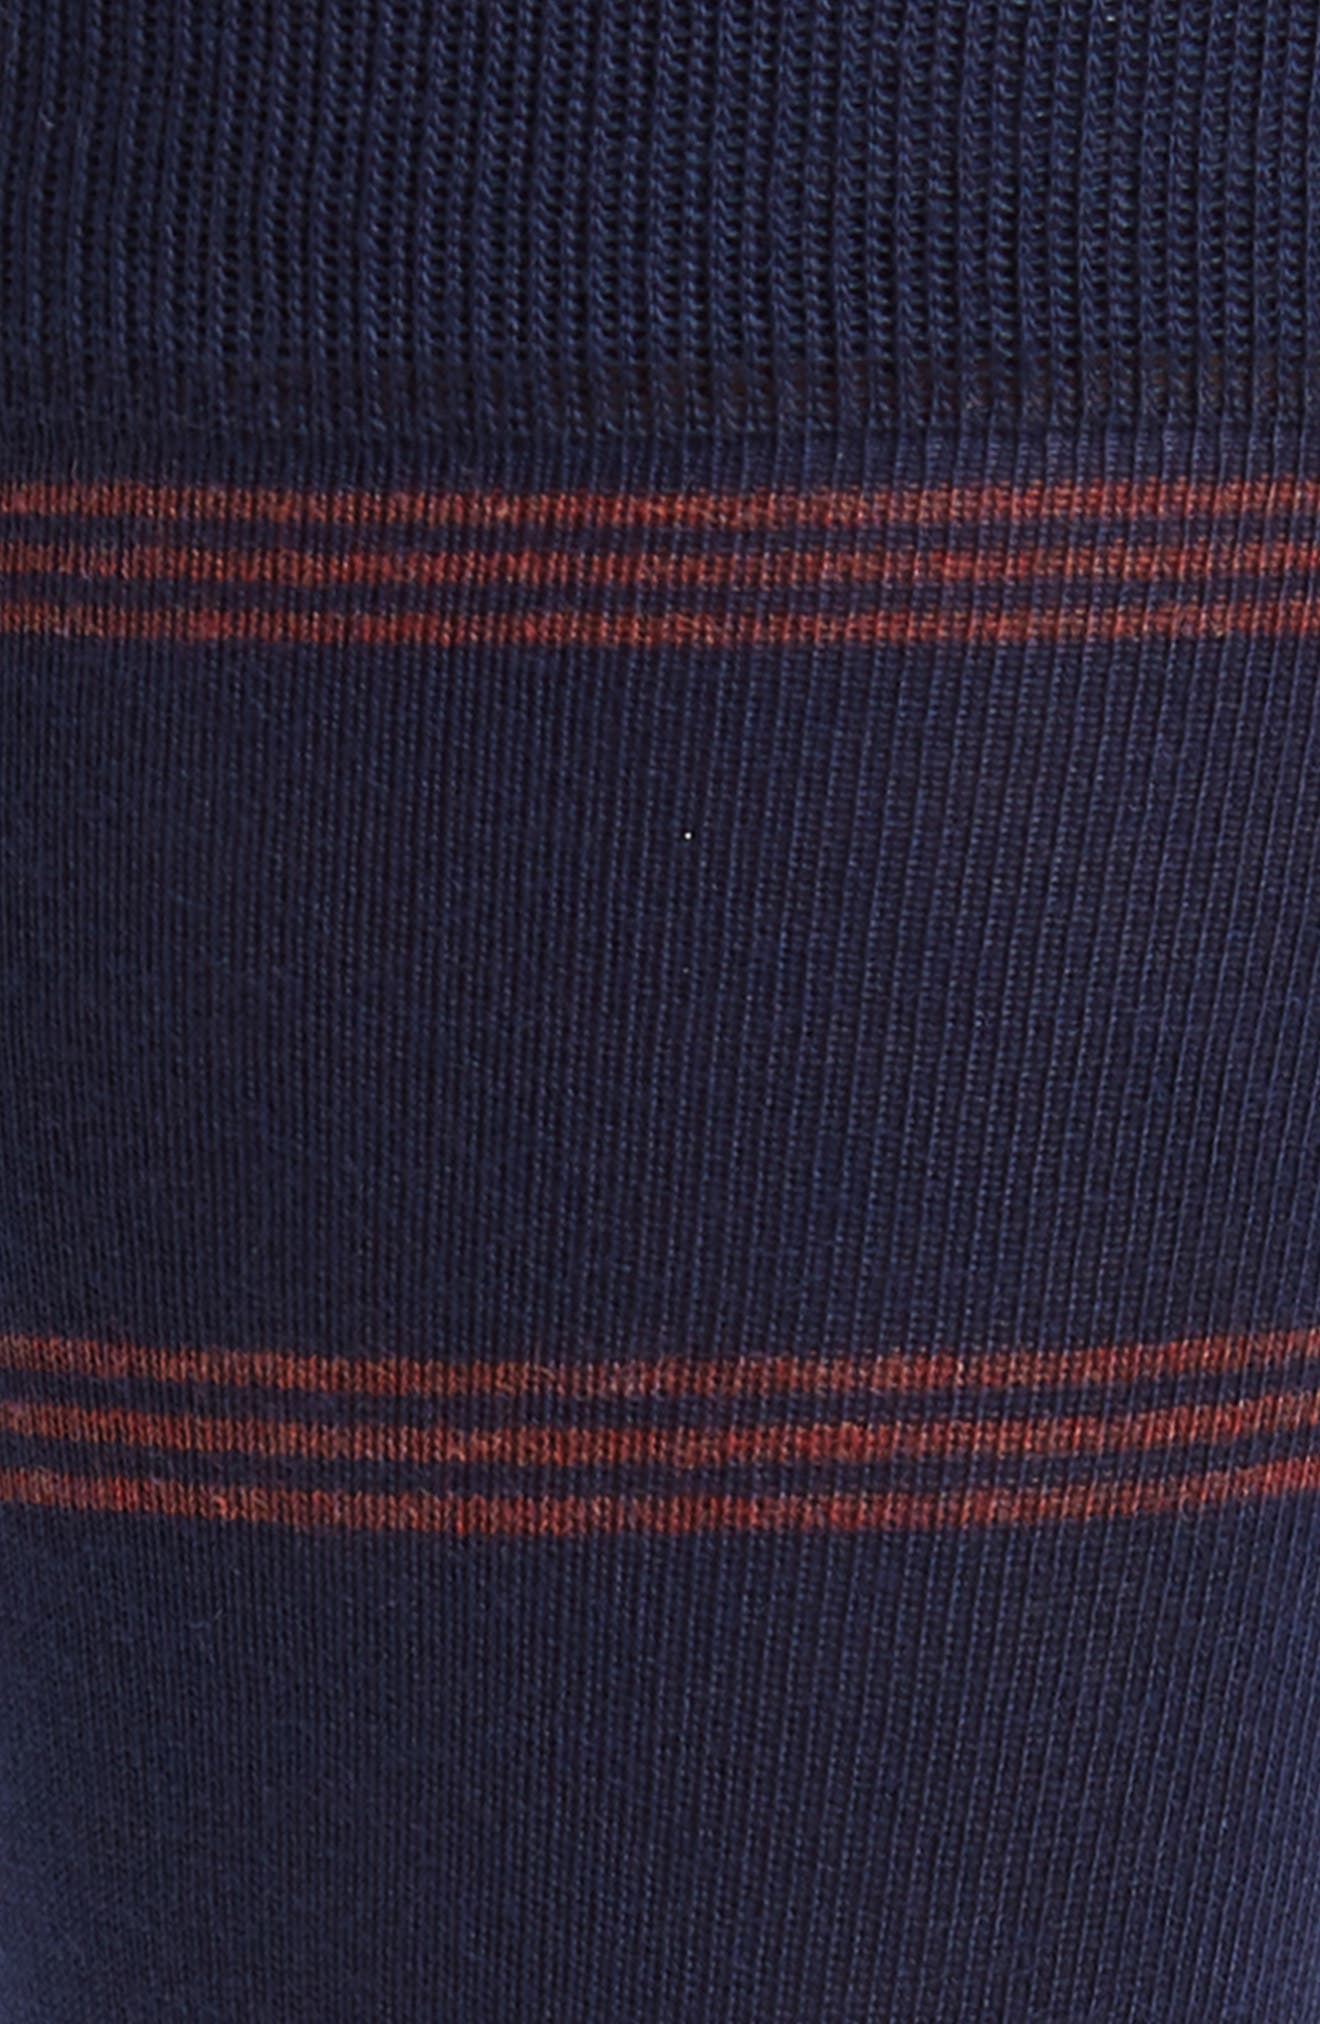 Triple Line Socks,                             Alternate thumbnail 2, color,